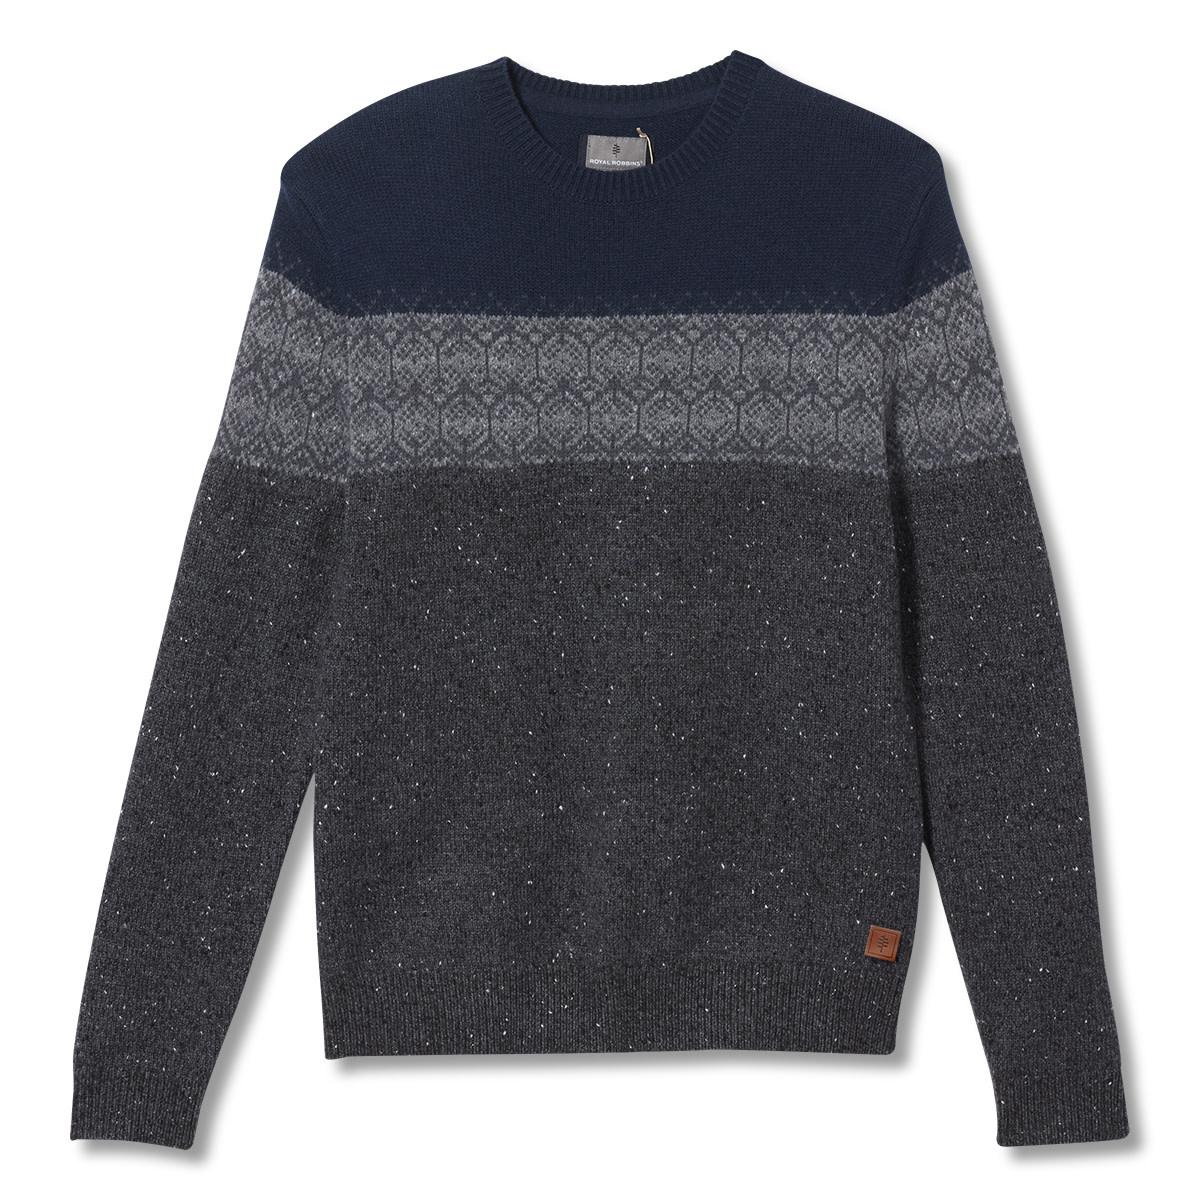 Banff Novelty Sweater, Charcoal